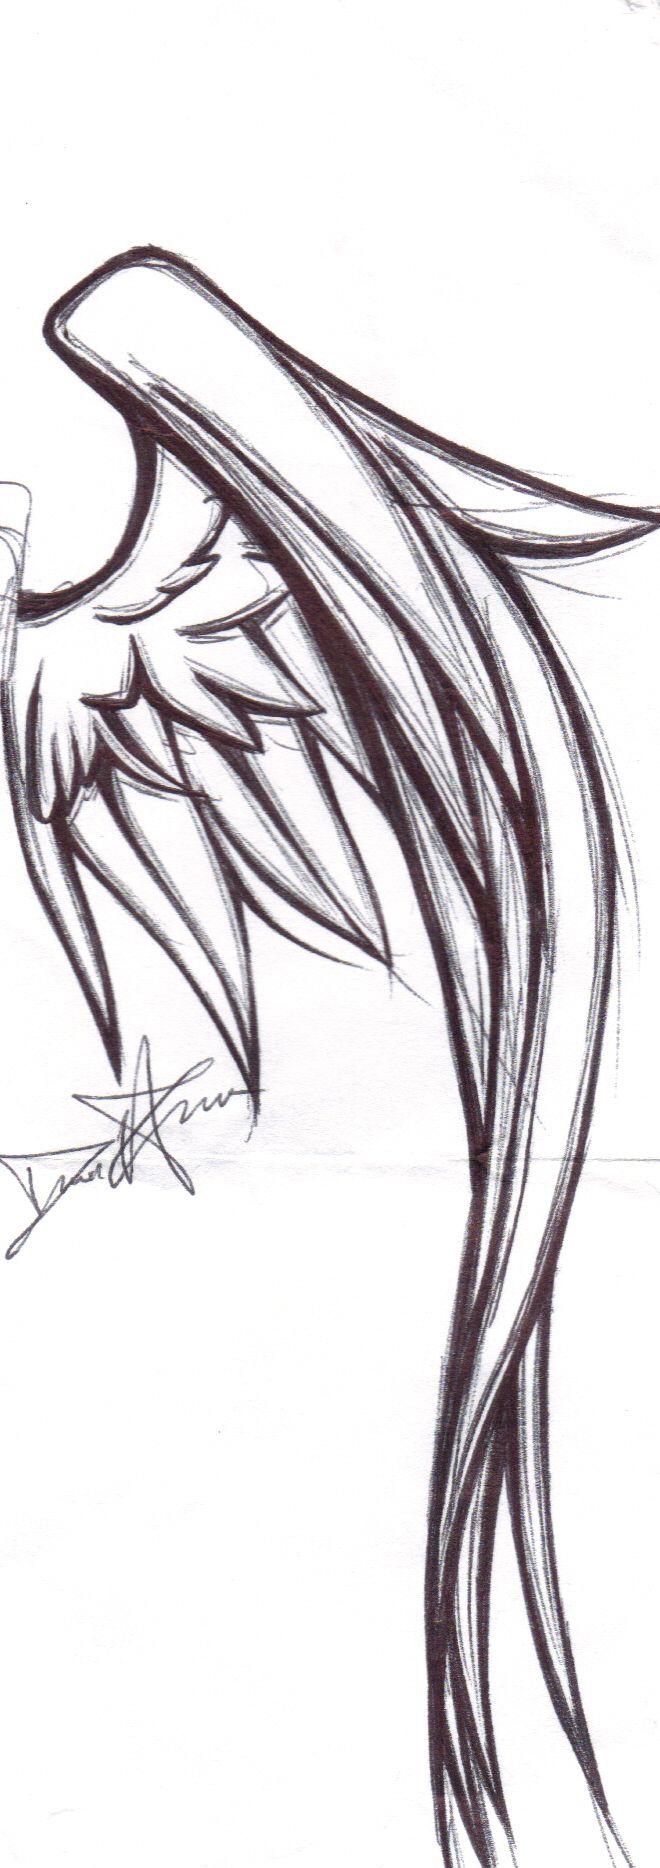 Wing tattoo design - Wing Tattoo Design By Kitty Kit